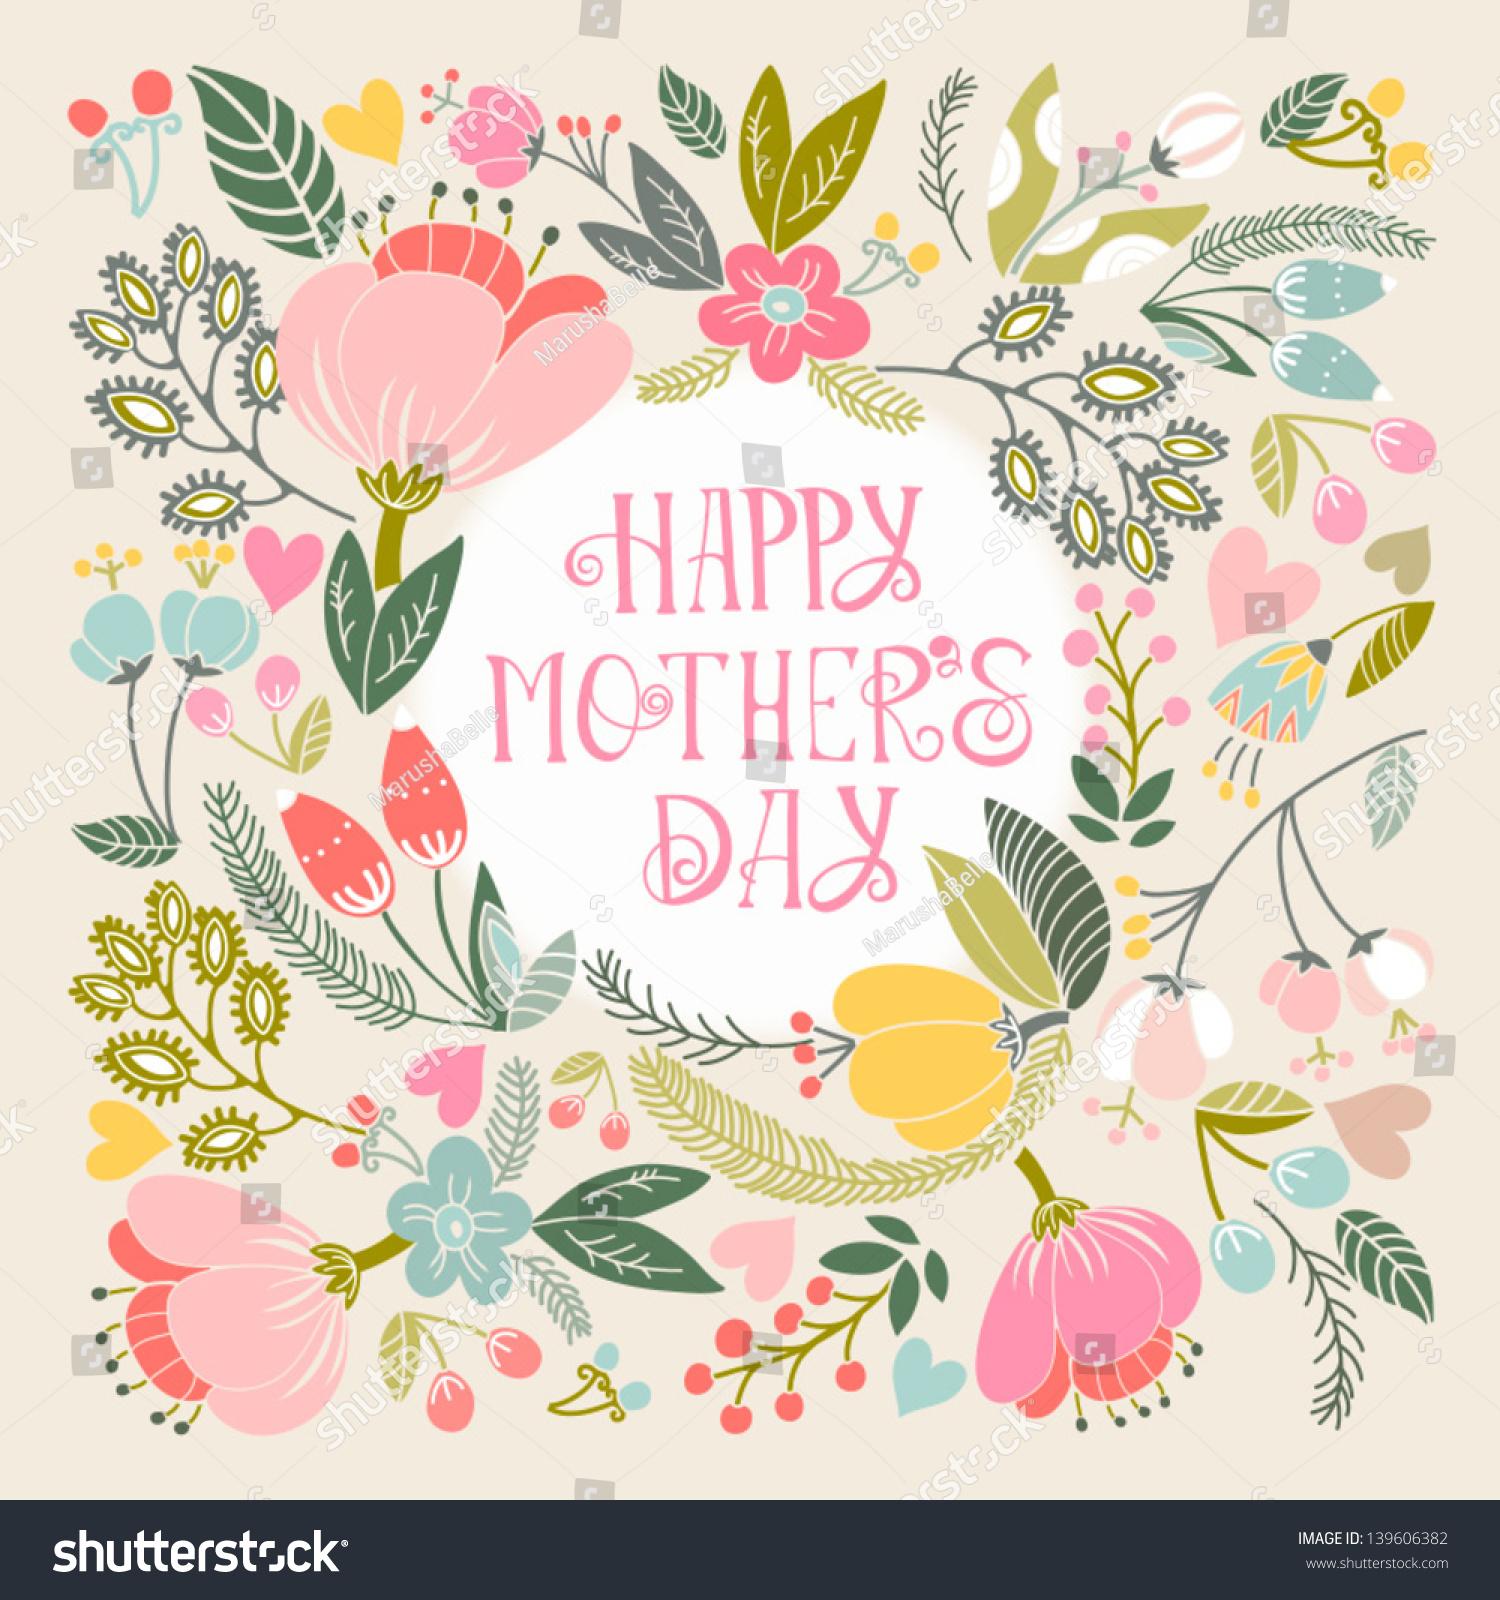 Beautiful greeting card happy mothers day stok vektr 139606382 beautiful greeting card happy mothers day stok vektr 139606382 shutterstock m4hsunfo